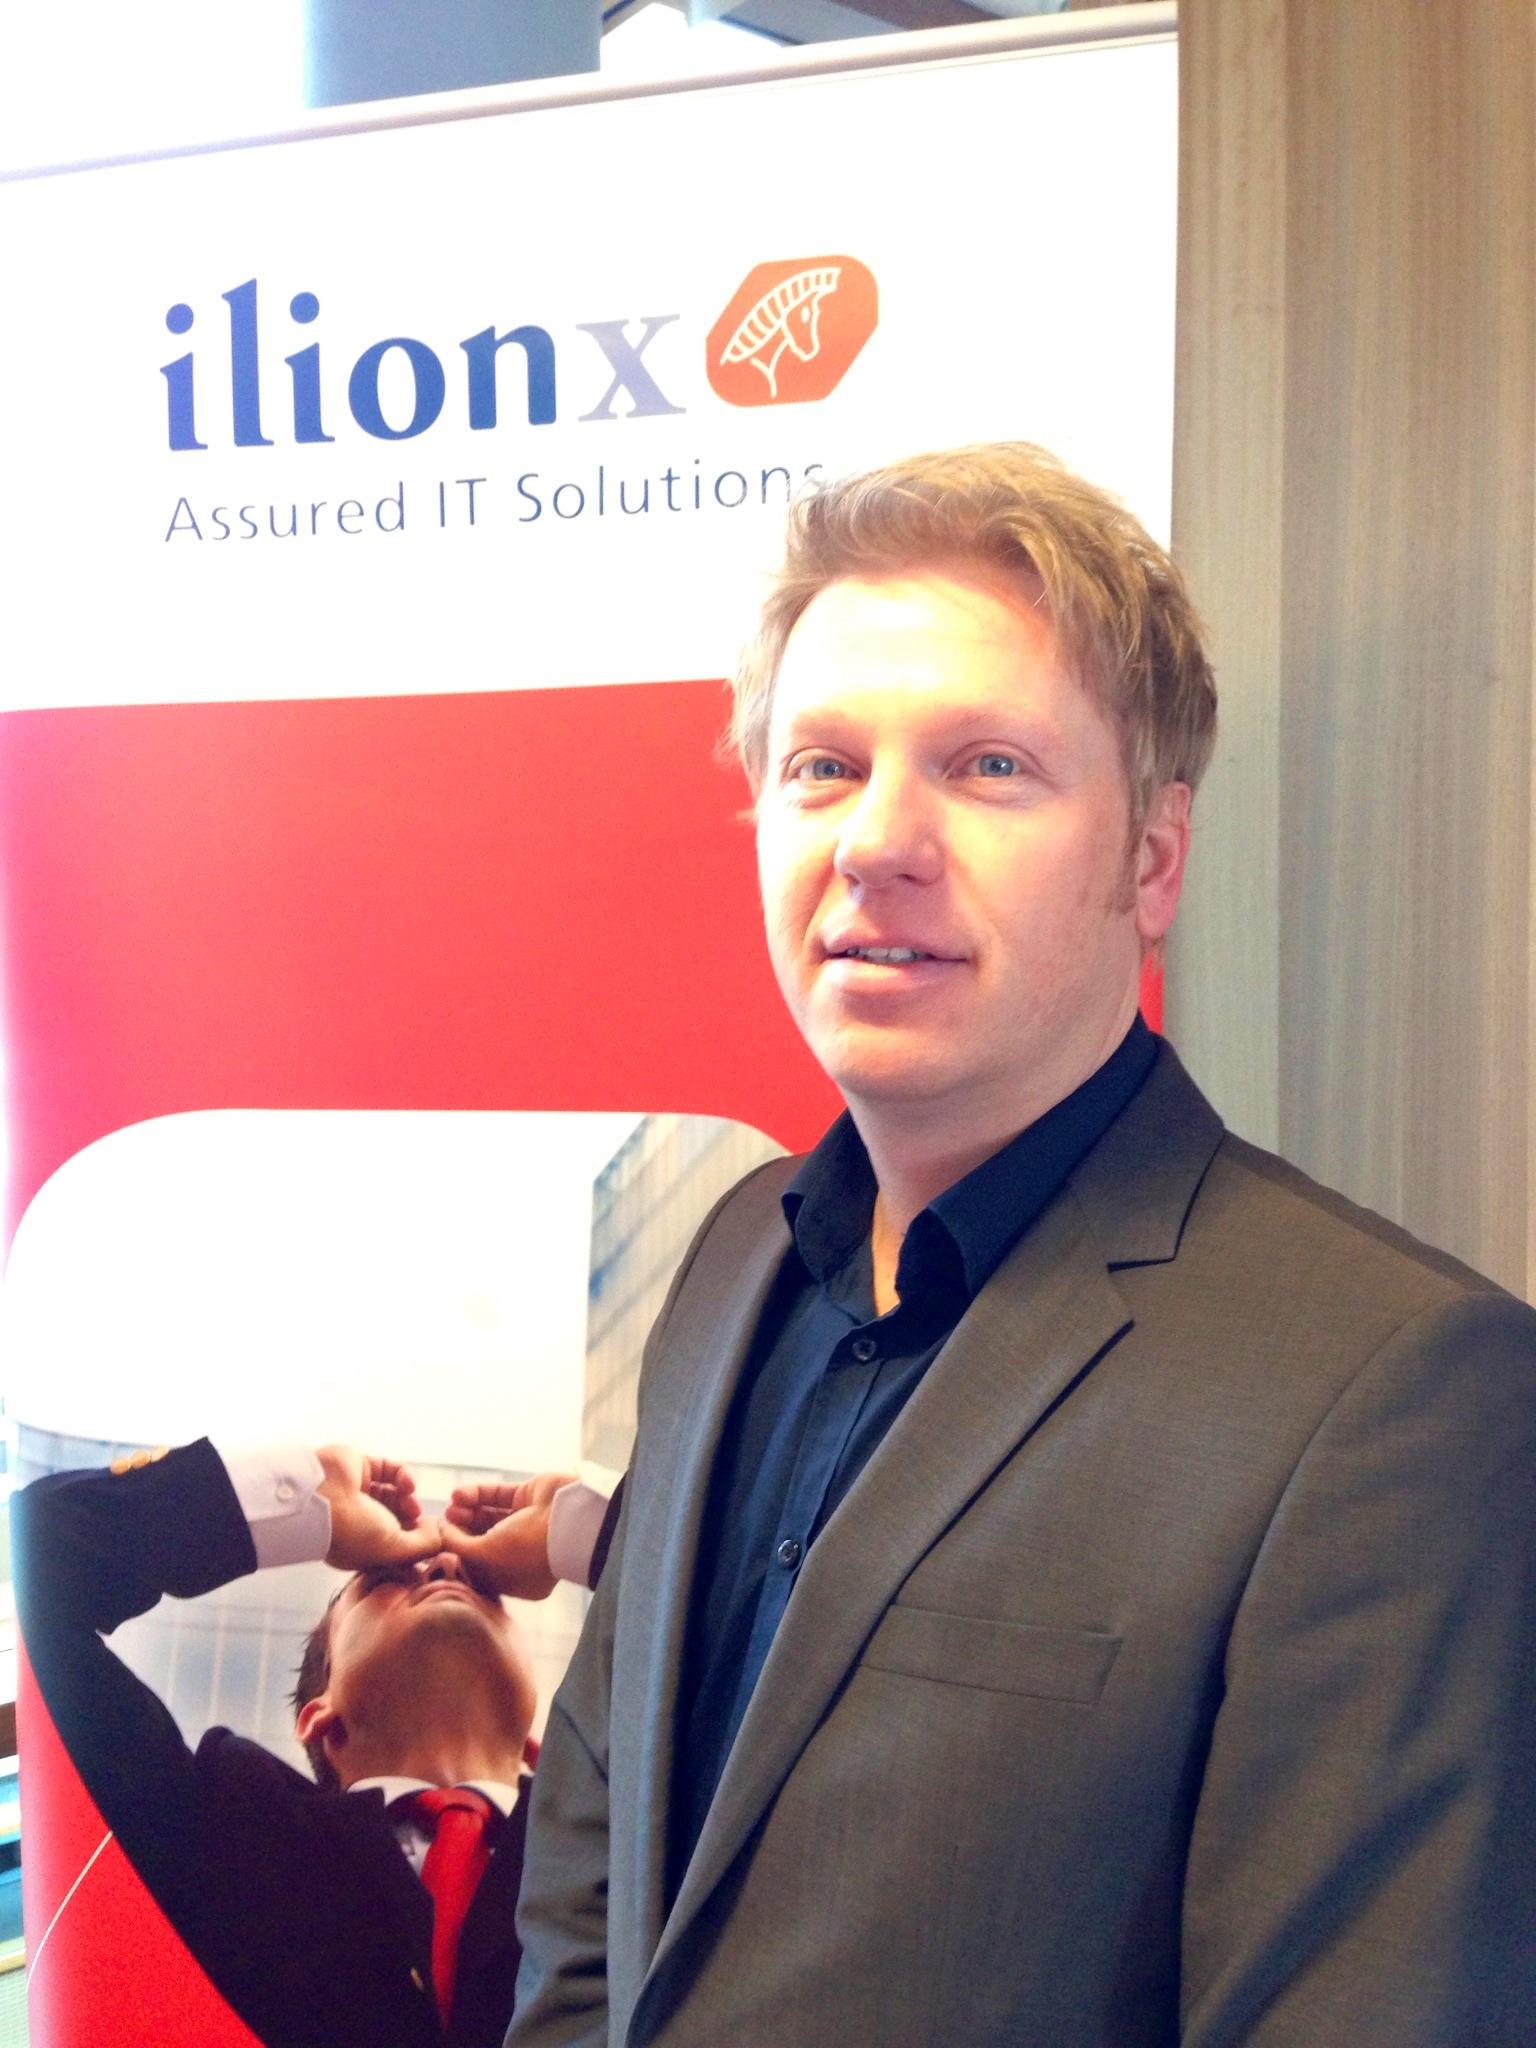 Paul van Geelen - Unit Manager Information Management